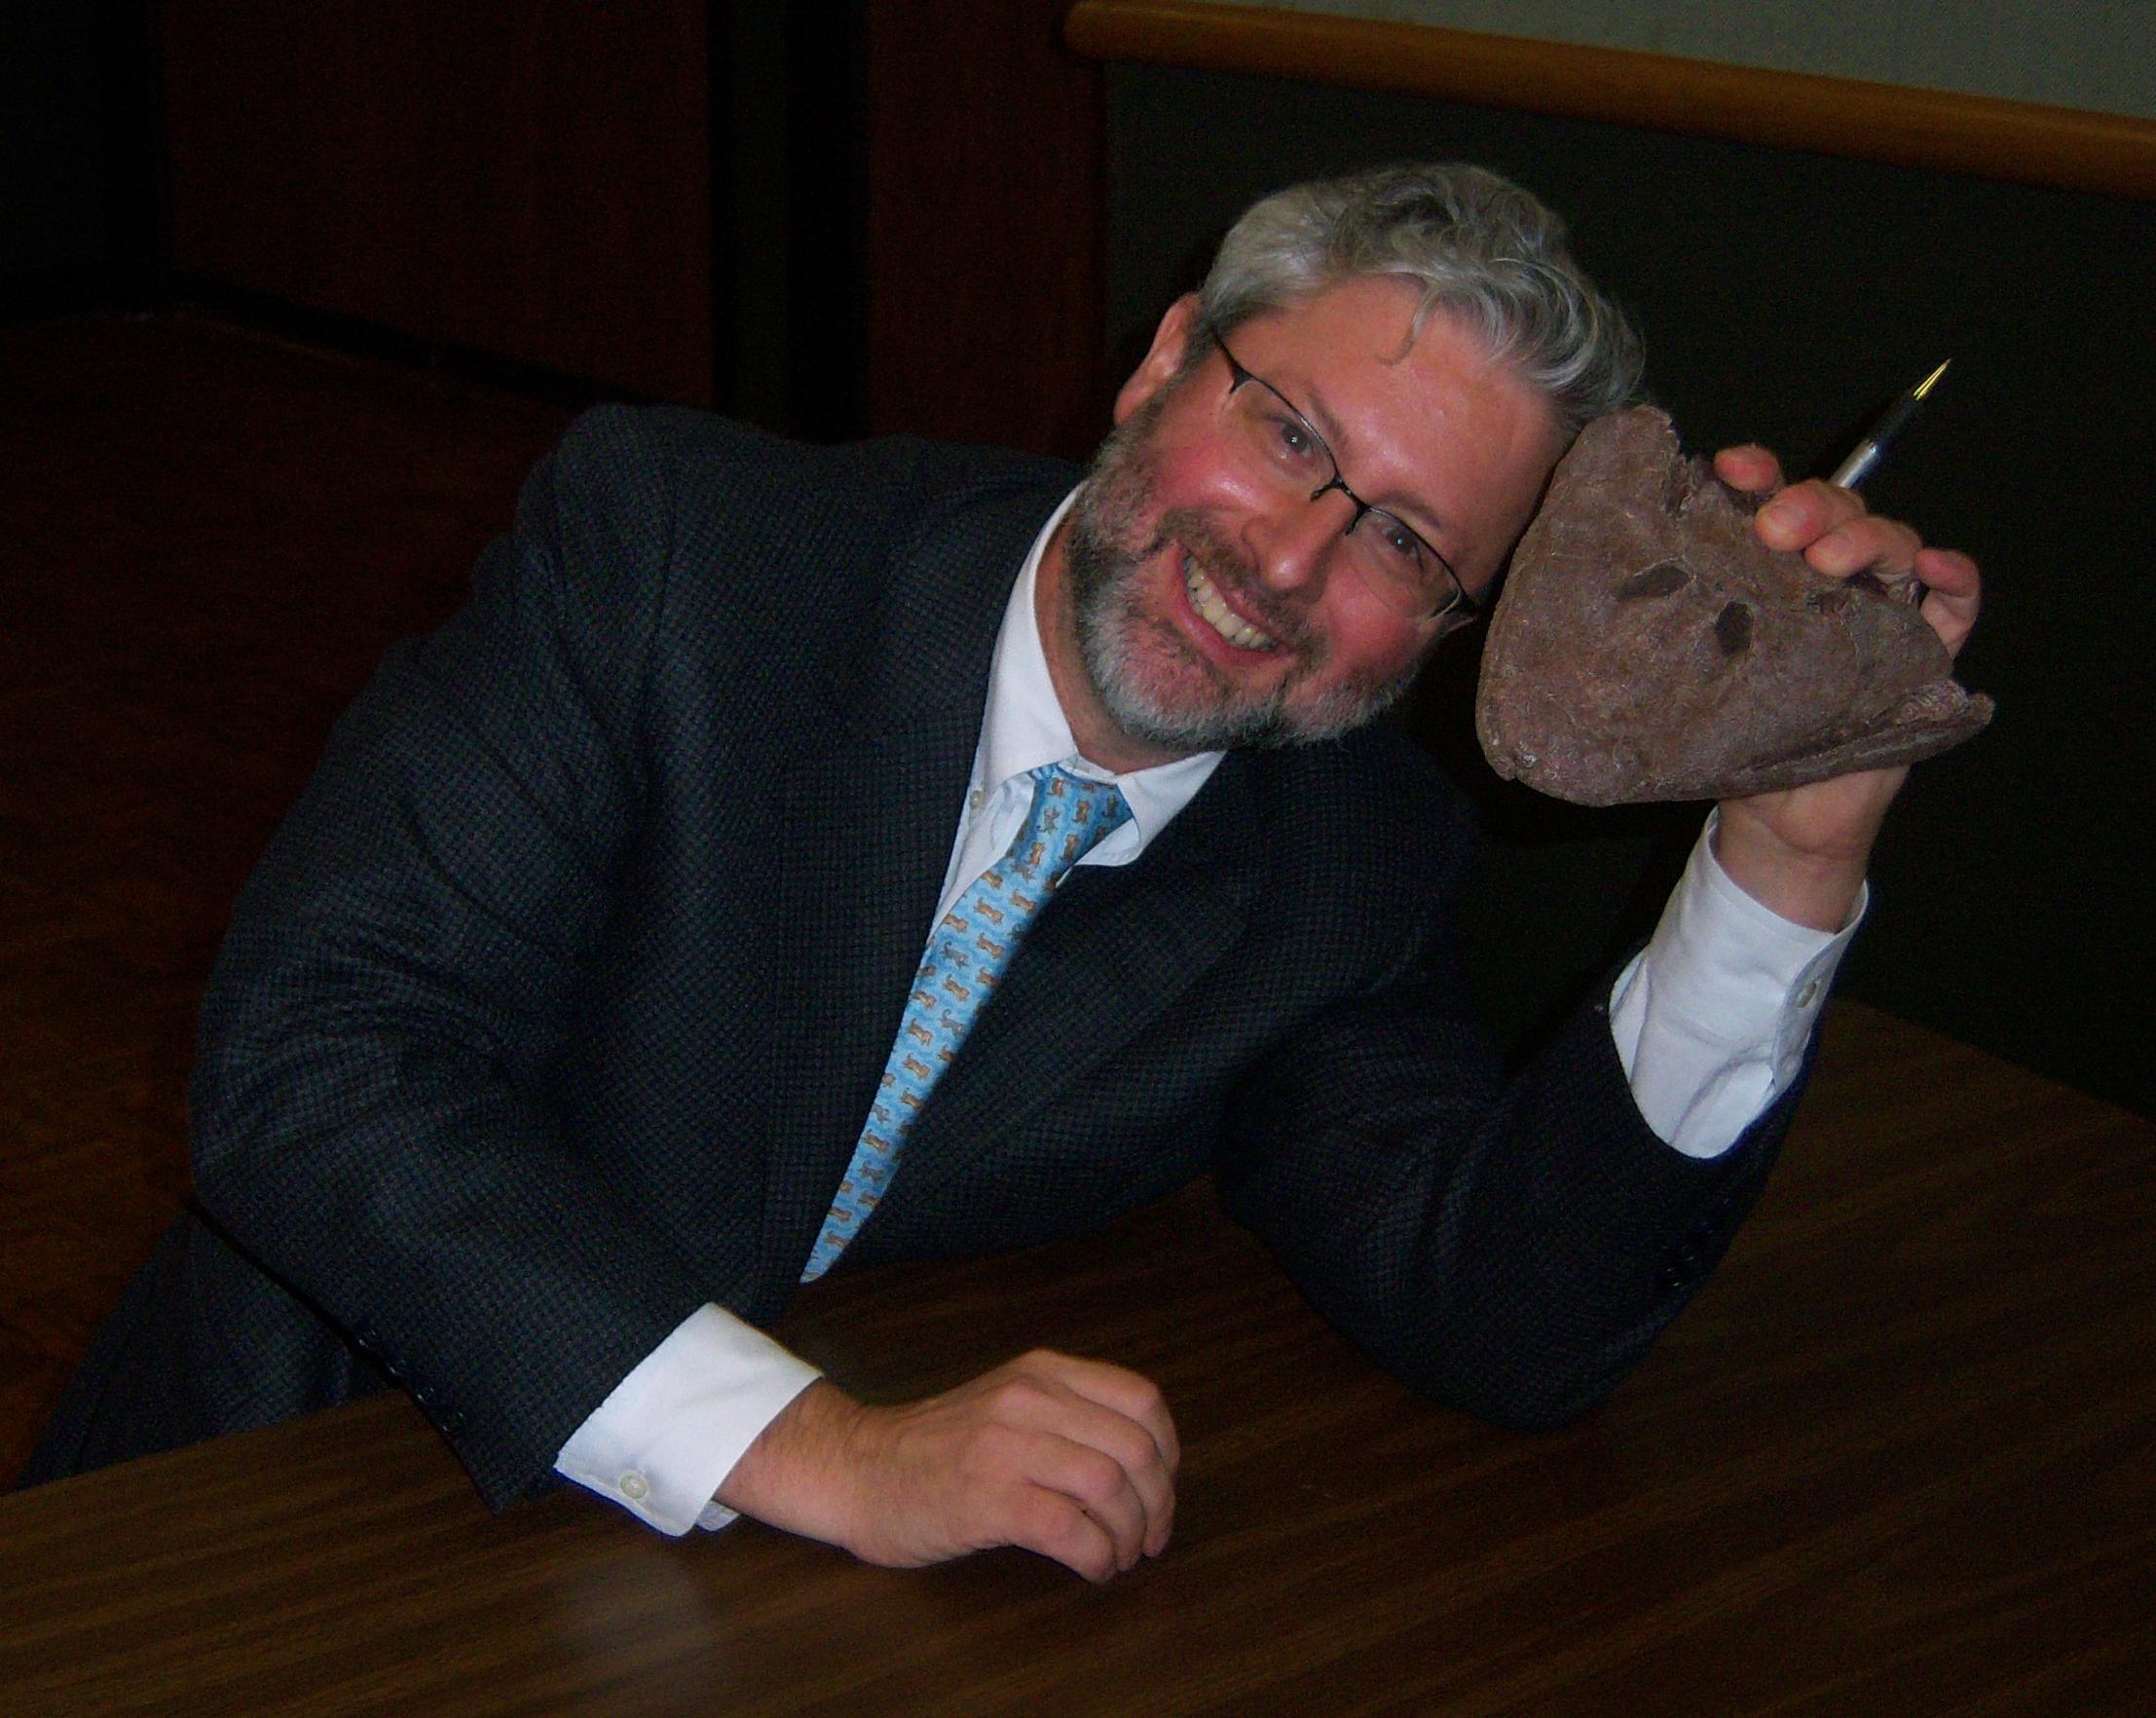 Neil Shubin after speaking at the [[University of Tulsa]]